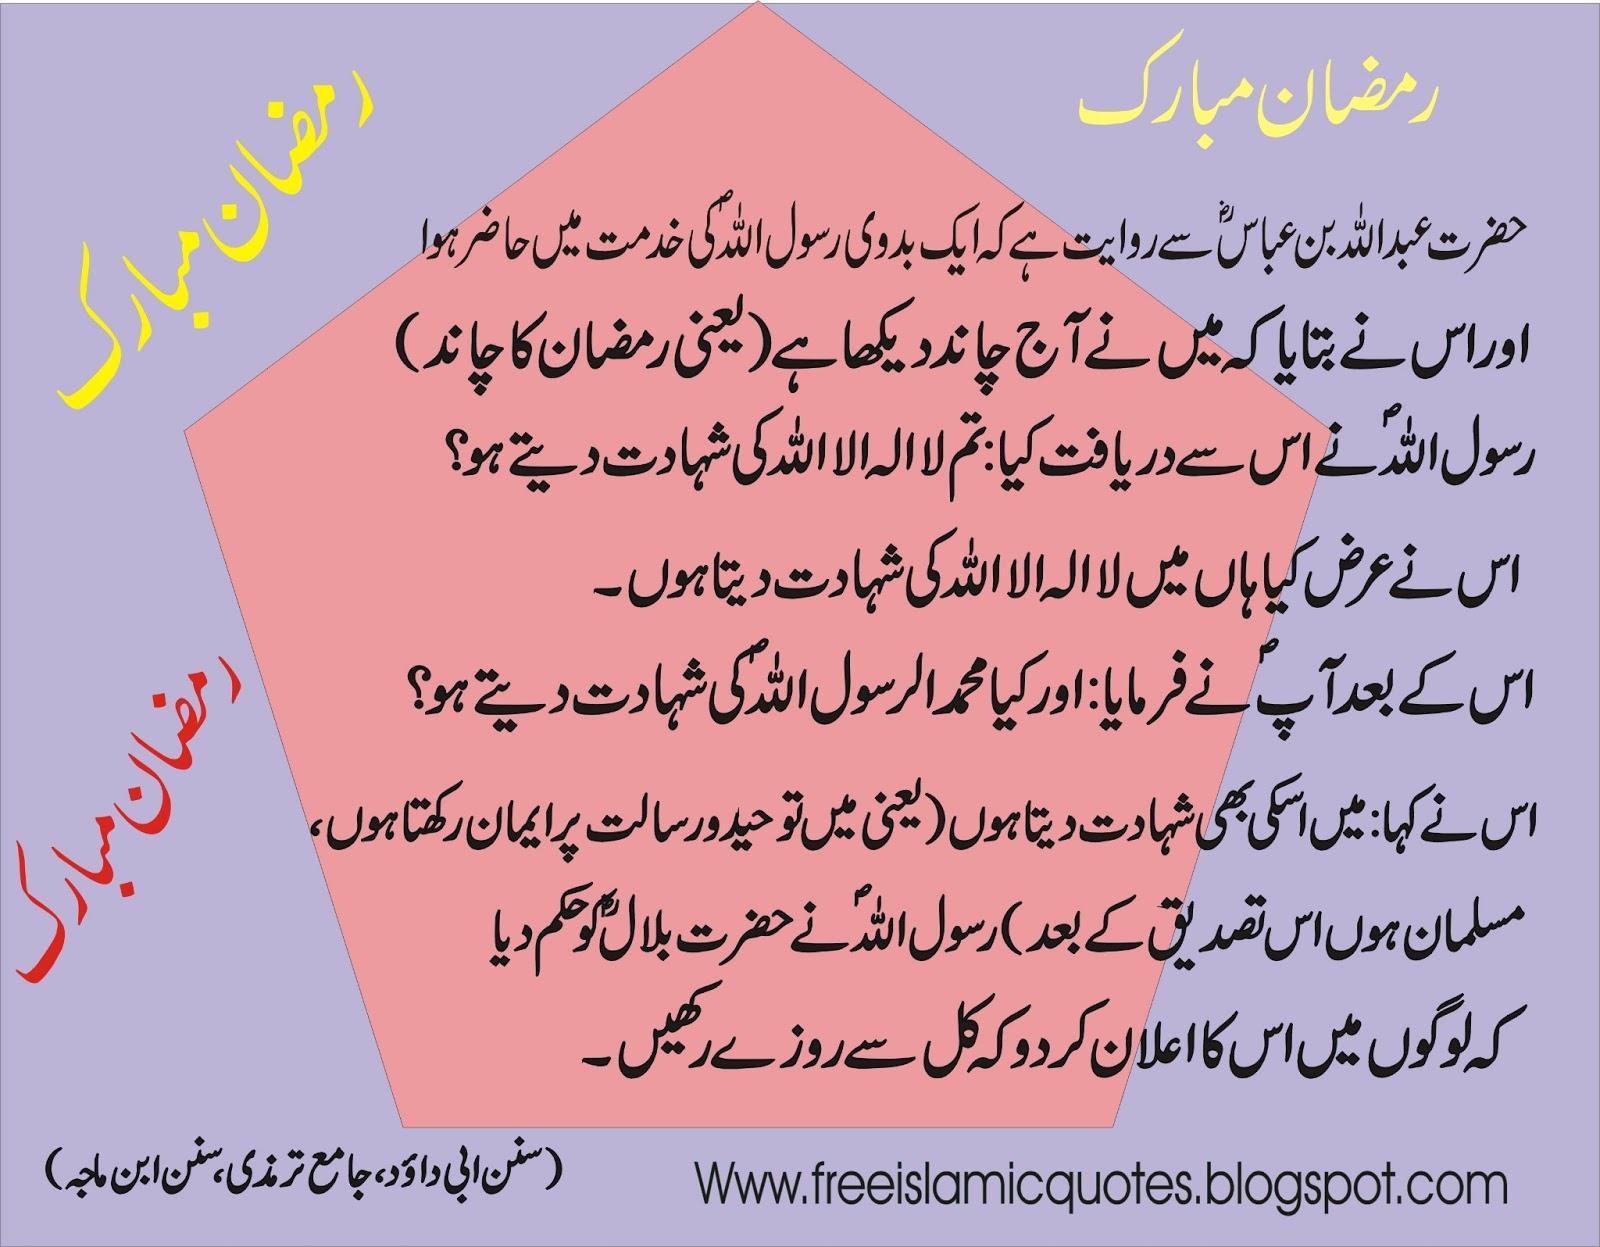 Islamic Quotes In Urdu Wallpapers: Beautiful Ramdaan ...